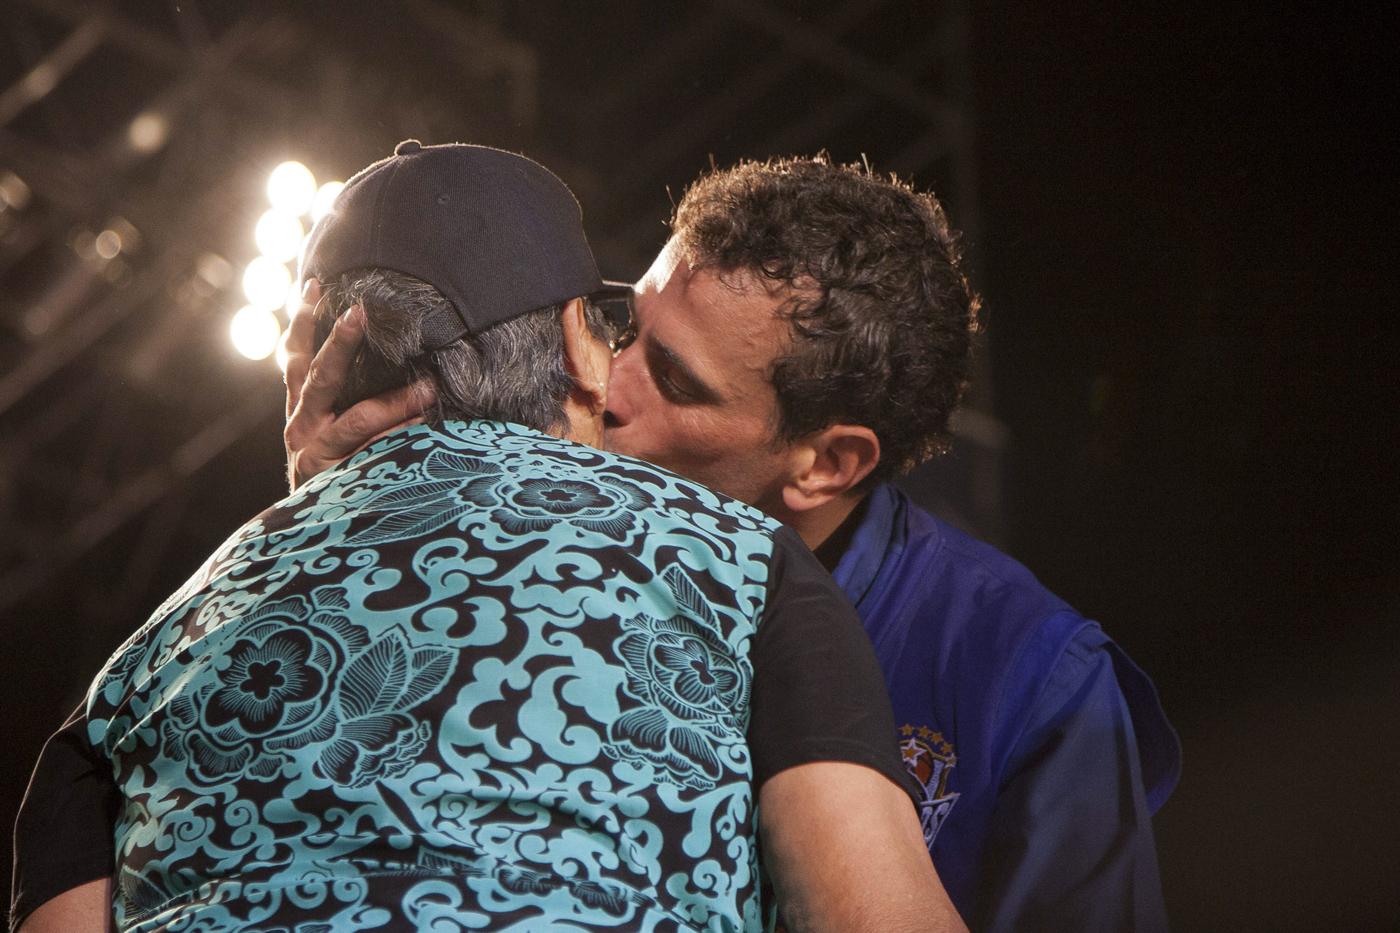 Así besa Capriles (Foto)